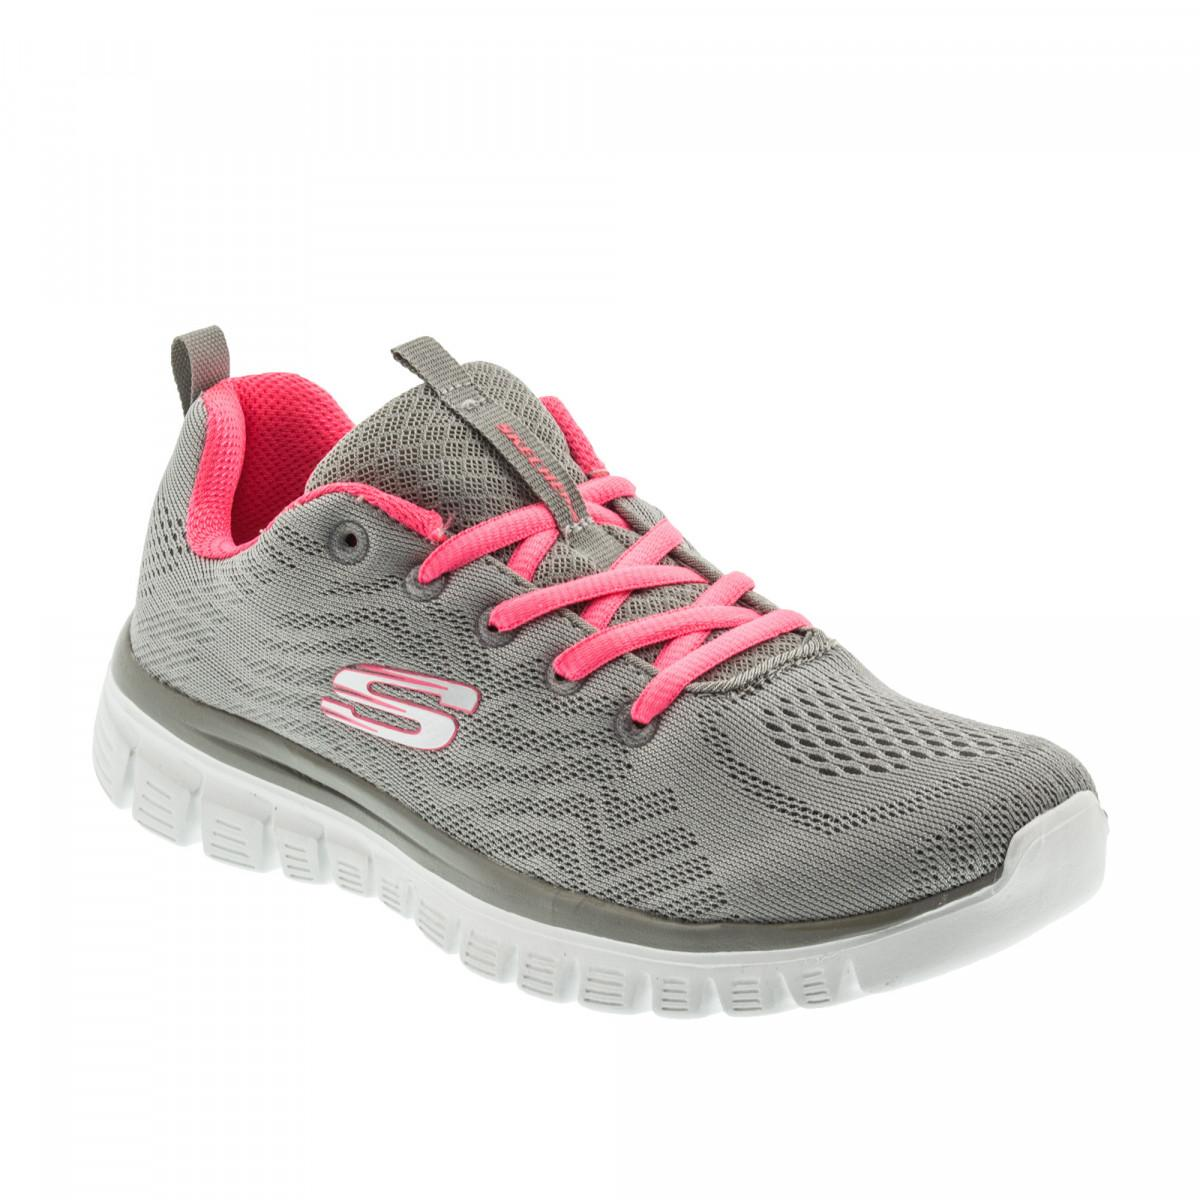 Sepatu Olahraga Wanita-Sepatu Senam Murah-Sepatu Lari-Sepatu Skechers Murah- Sepatu 6e28195cd4